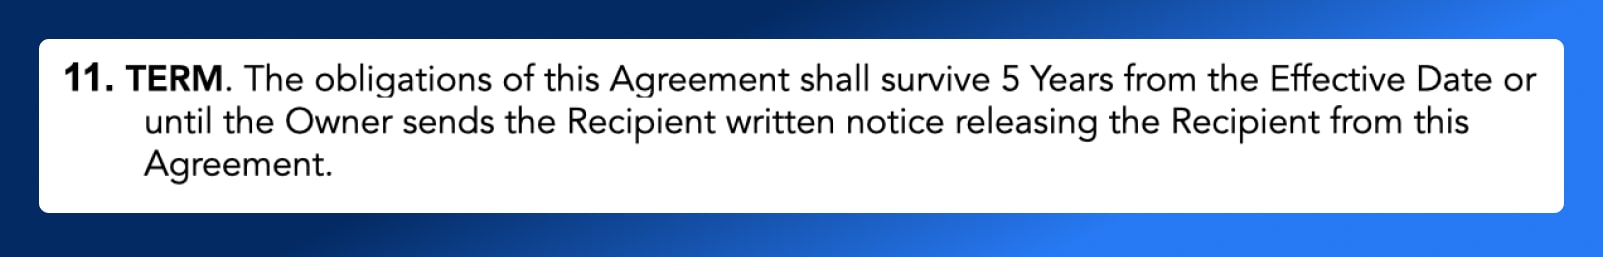 Non Disclosure Agreement - Term Length - Wrapbook